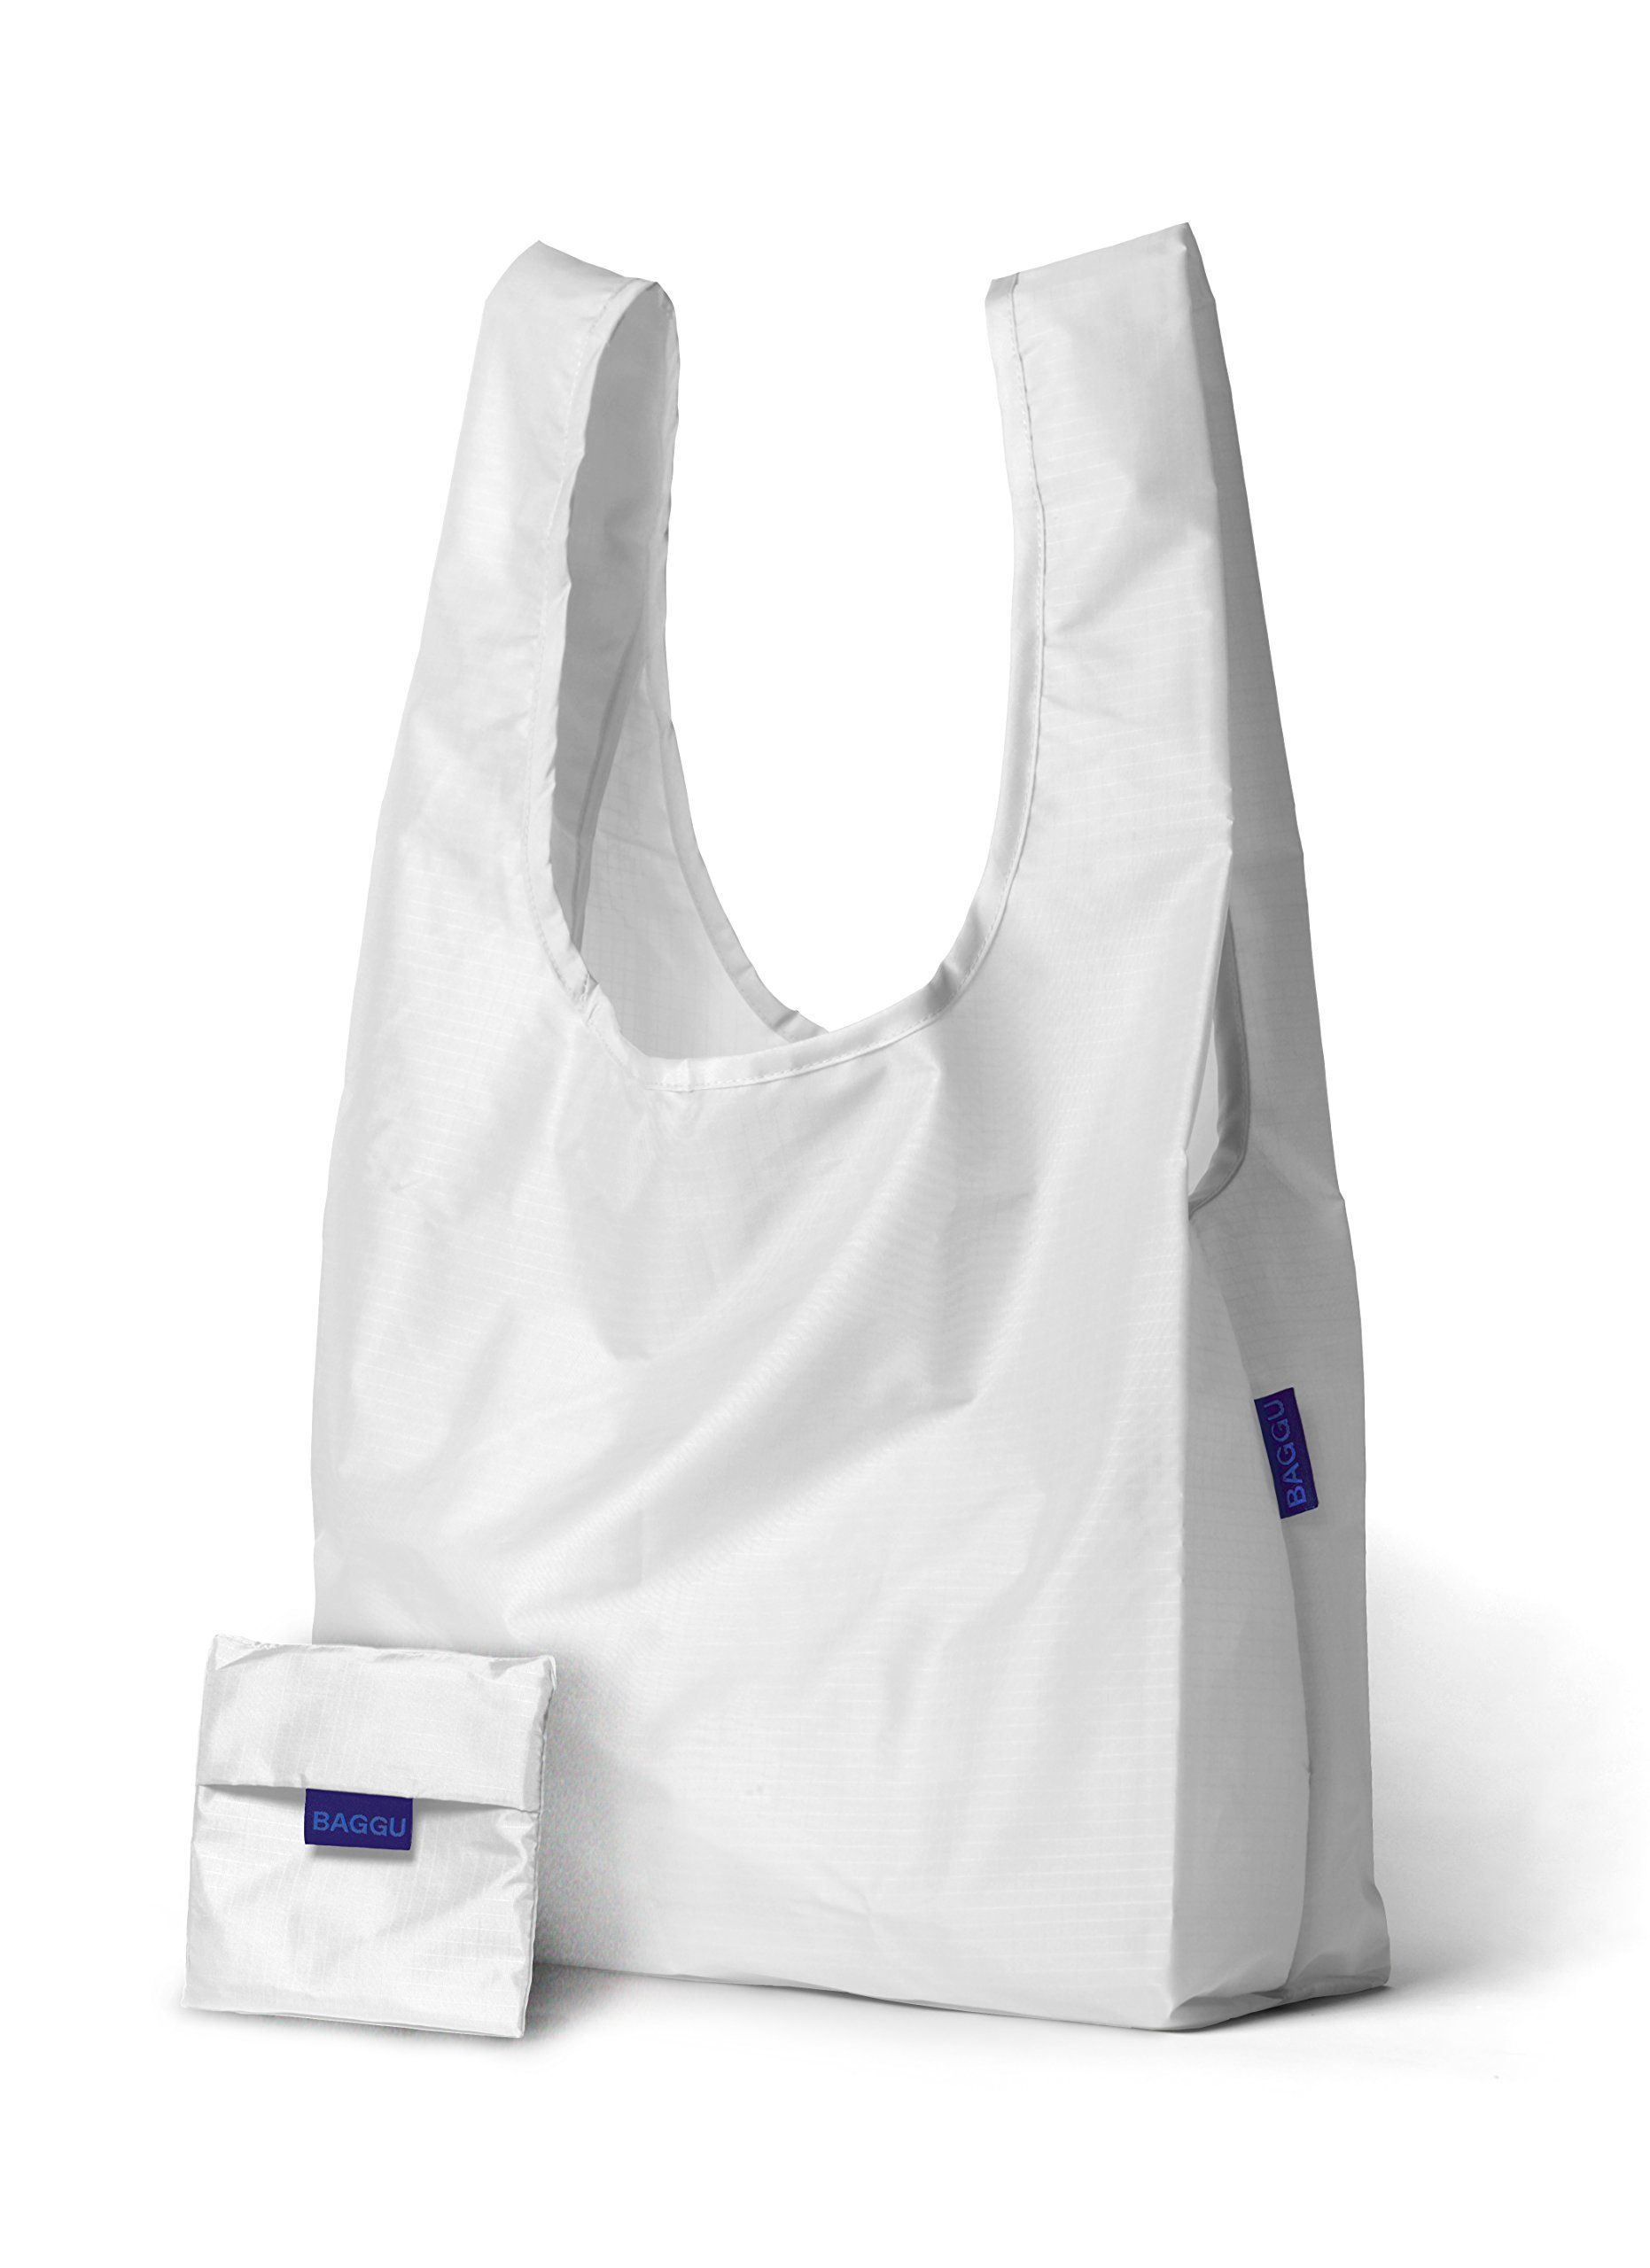 2393d08c0eb0 BAGGU Standard Reusable Shopping - White | Mama's Wish List | Bags ...